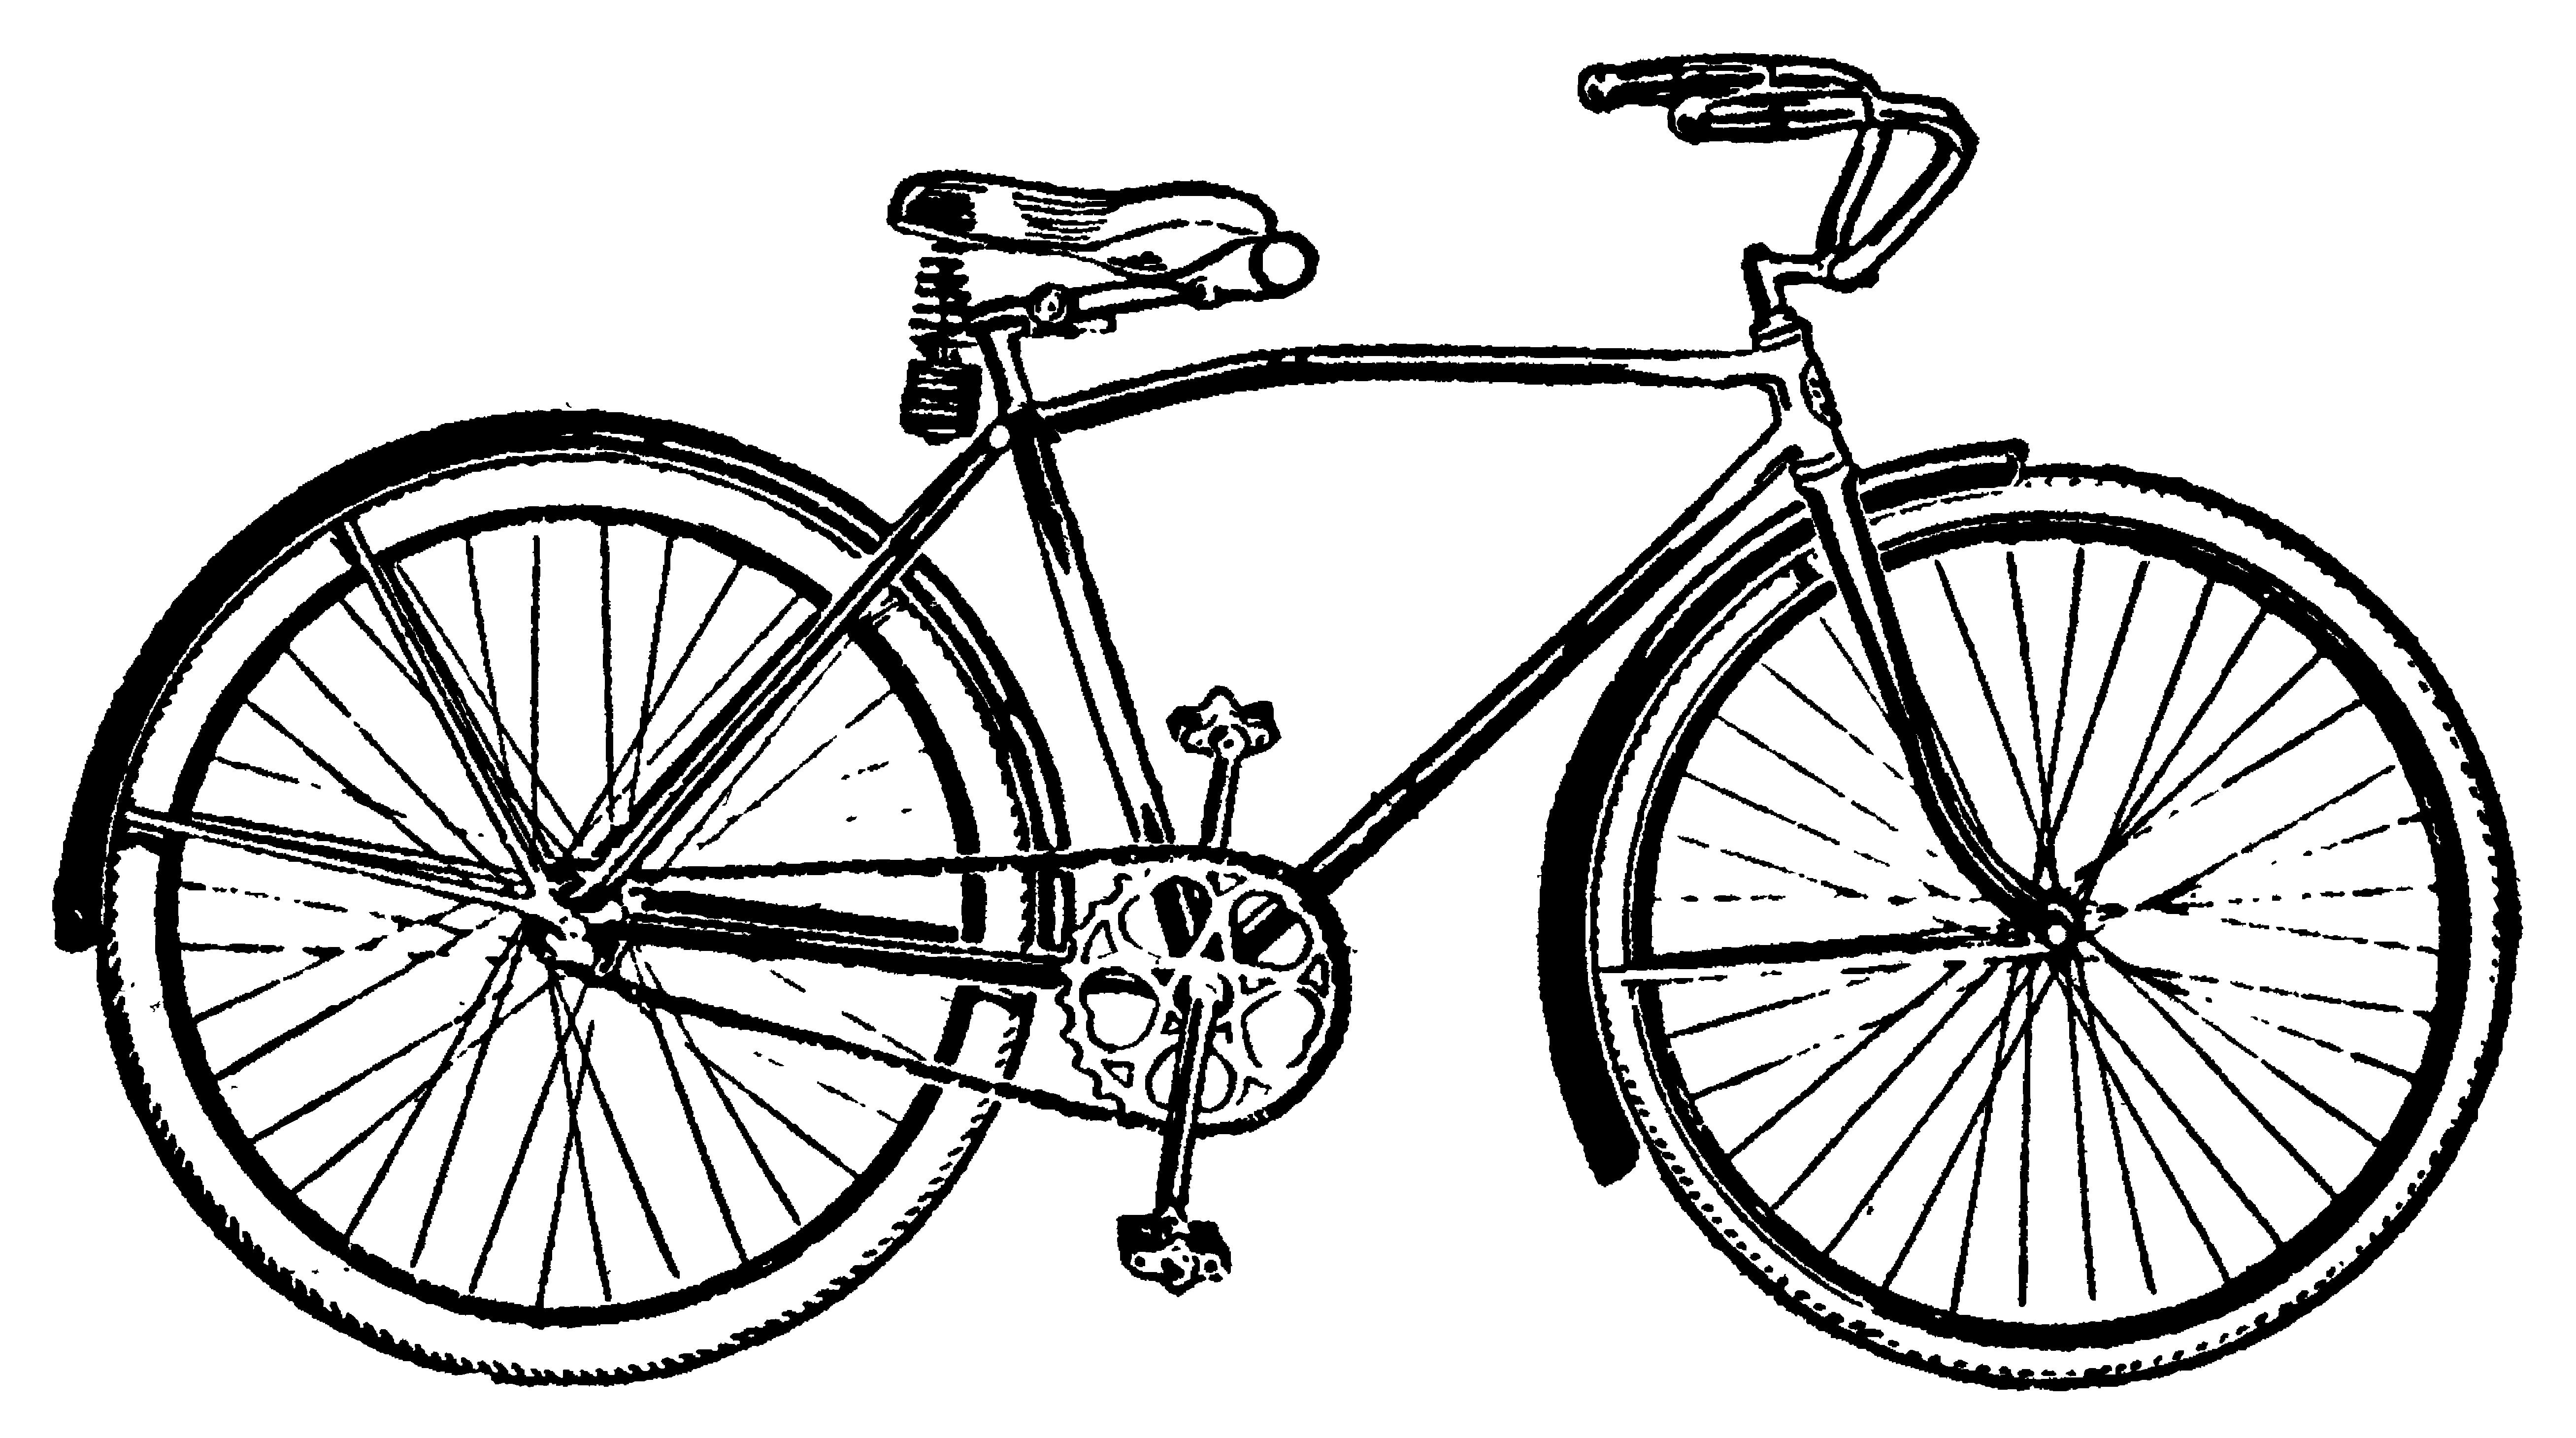 Pushbike clipart line drawing Clip 17 Vintage Vintage Art